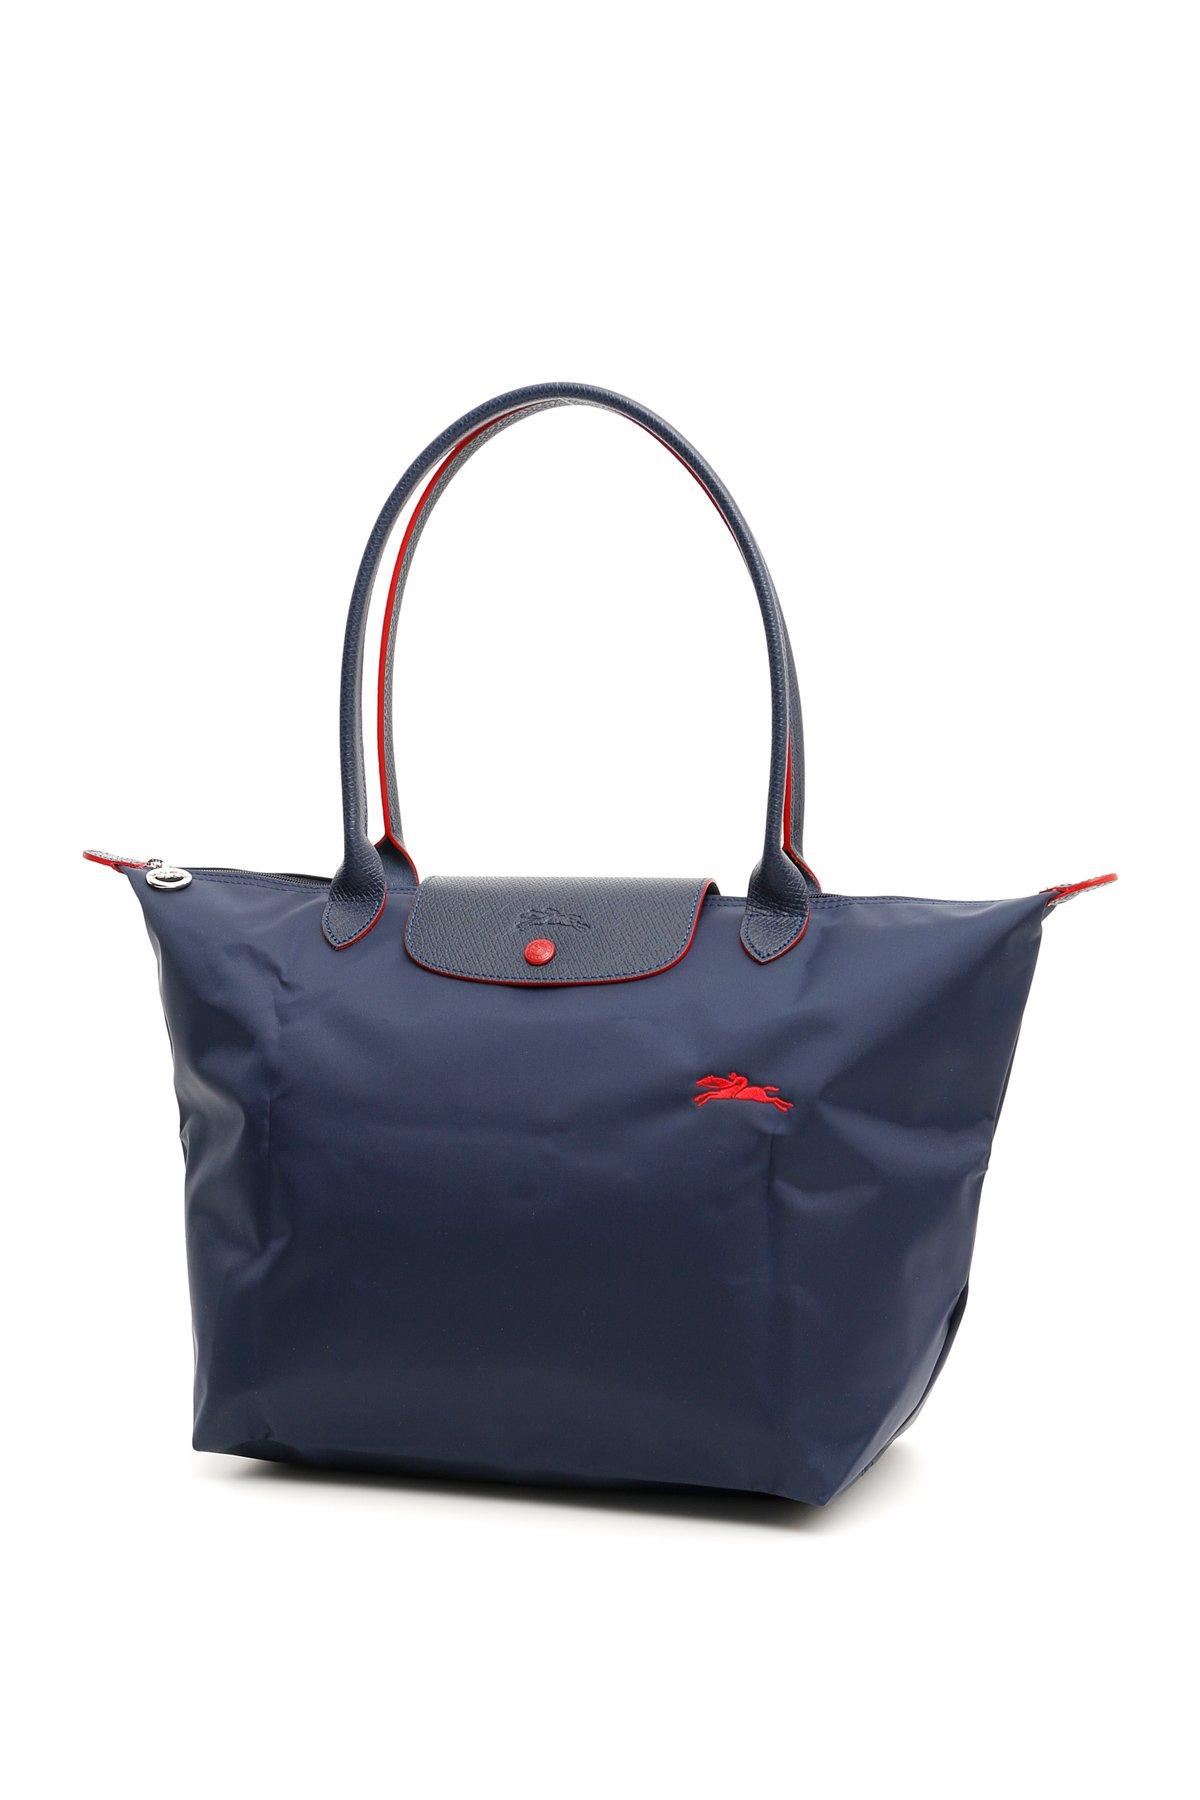 Longchamp shopping large le pliage club